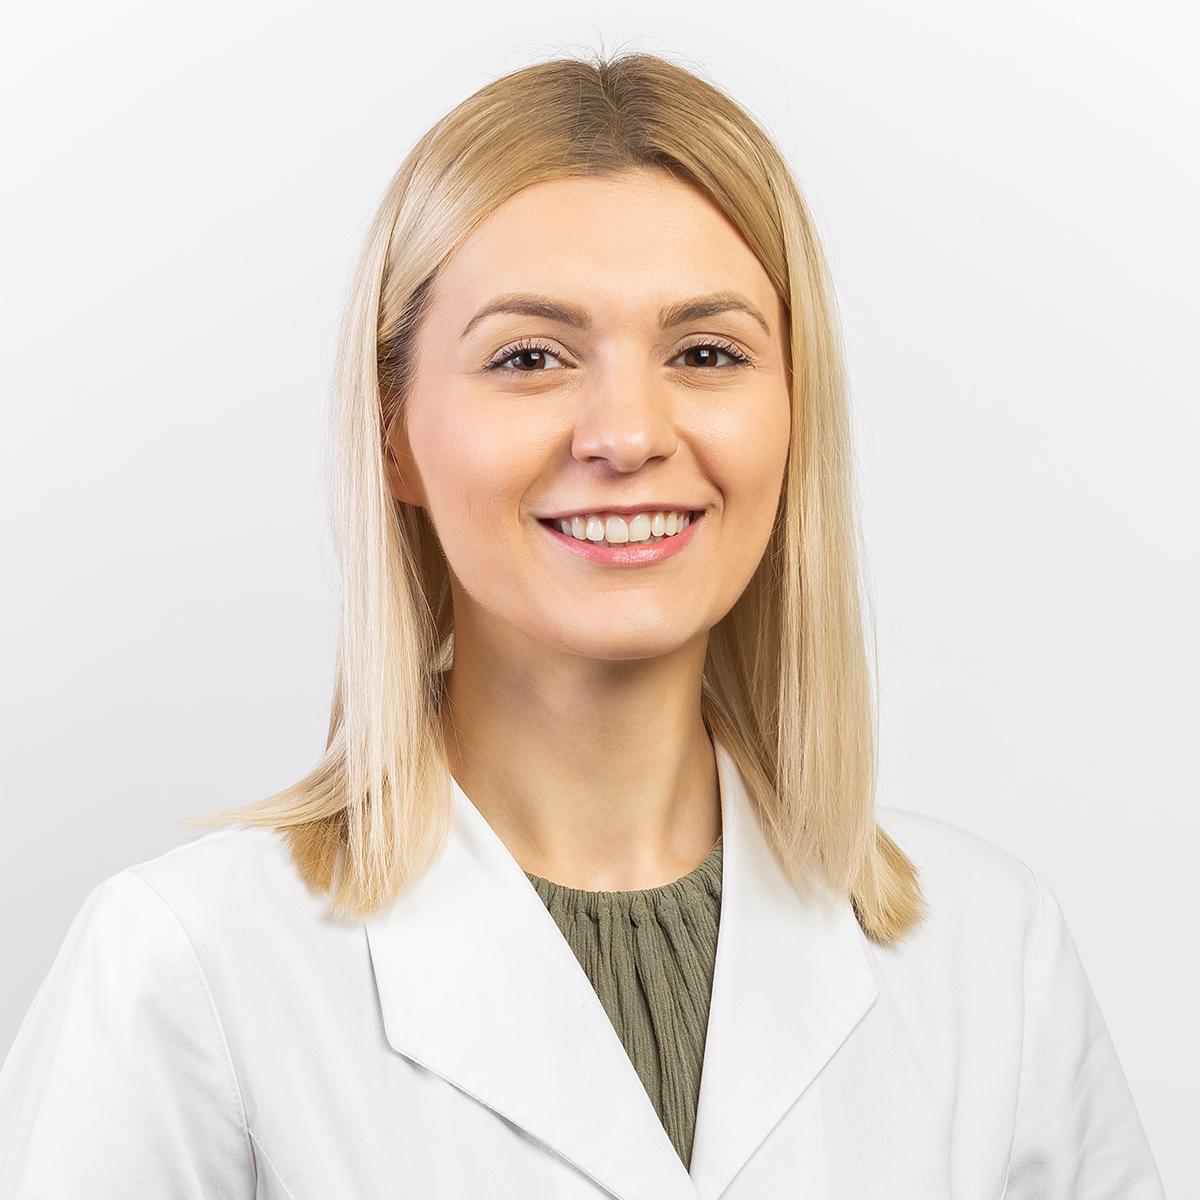 Milica Milenkovic